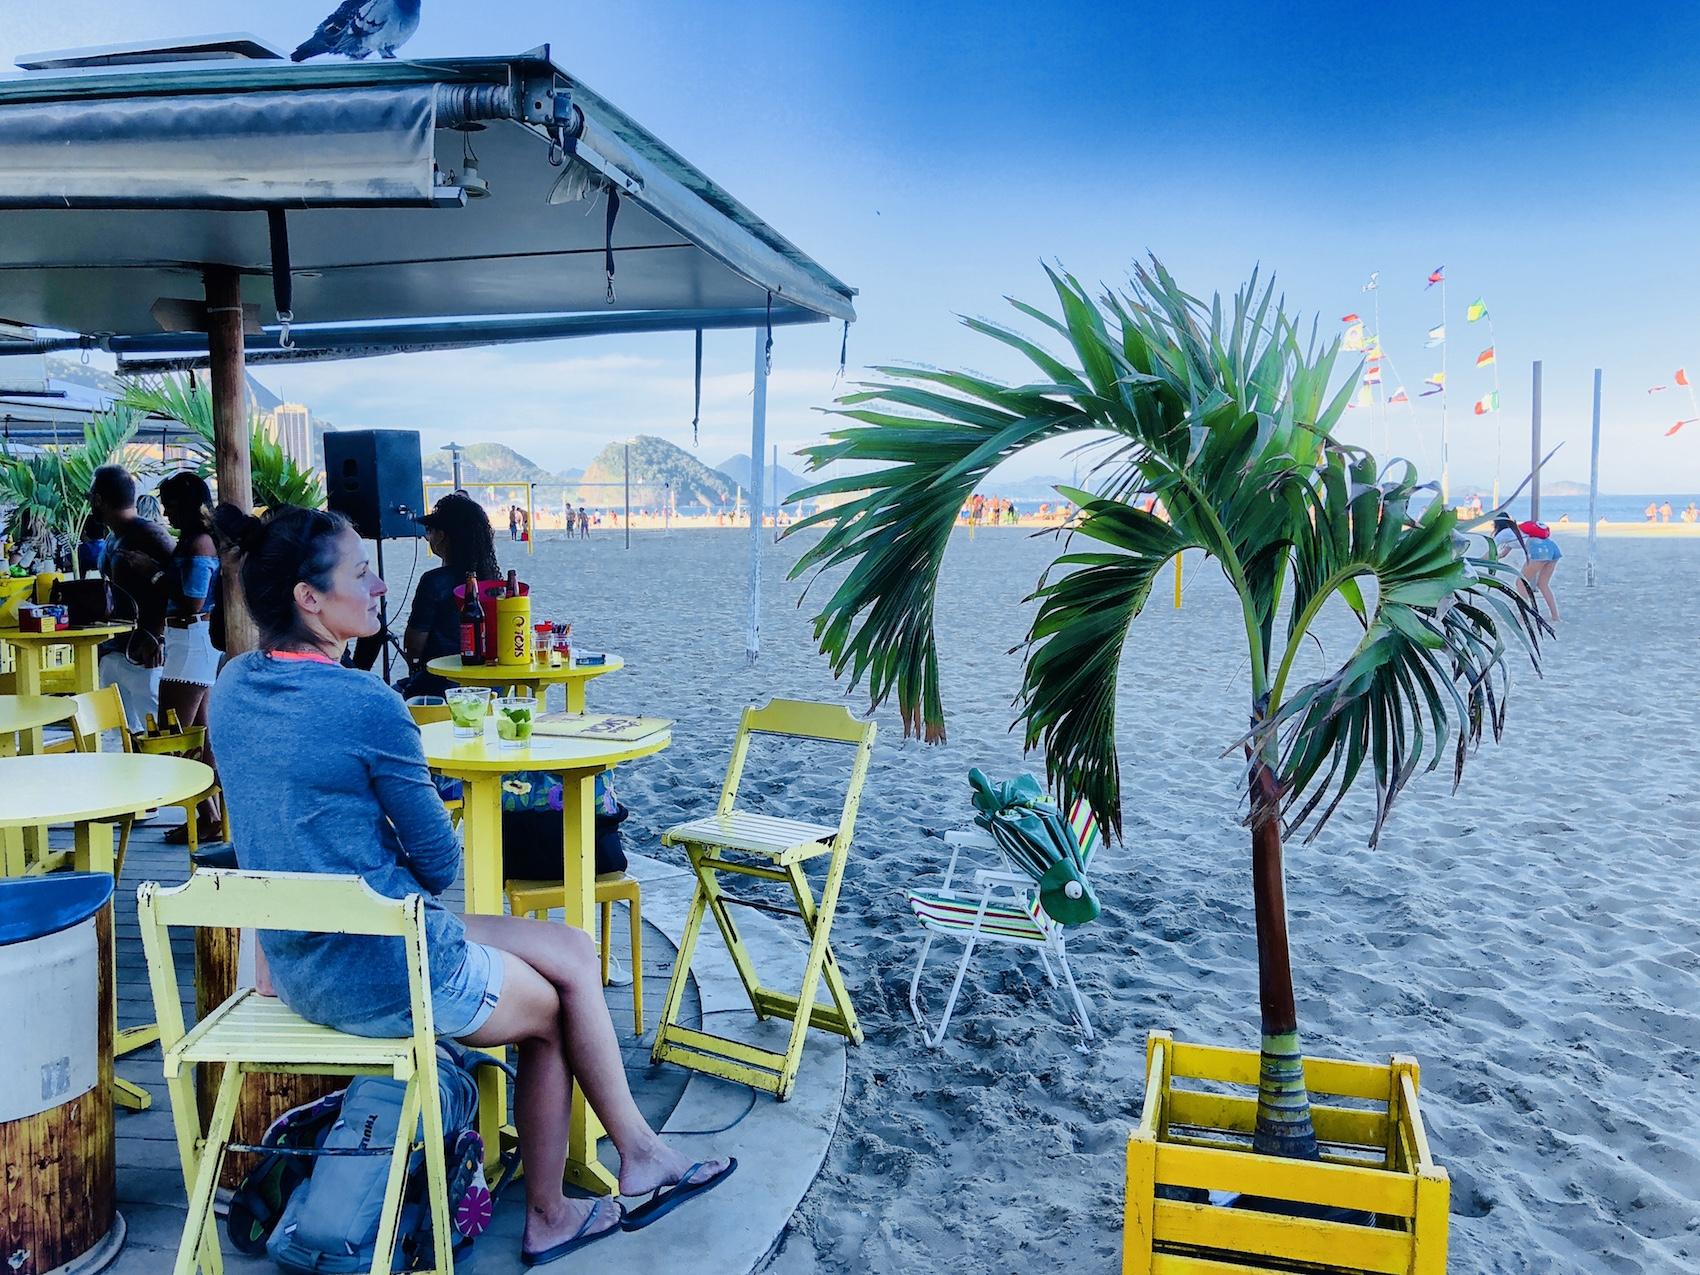 Frau in einer Strandbar an der Copacabana in Rio